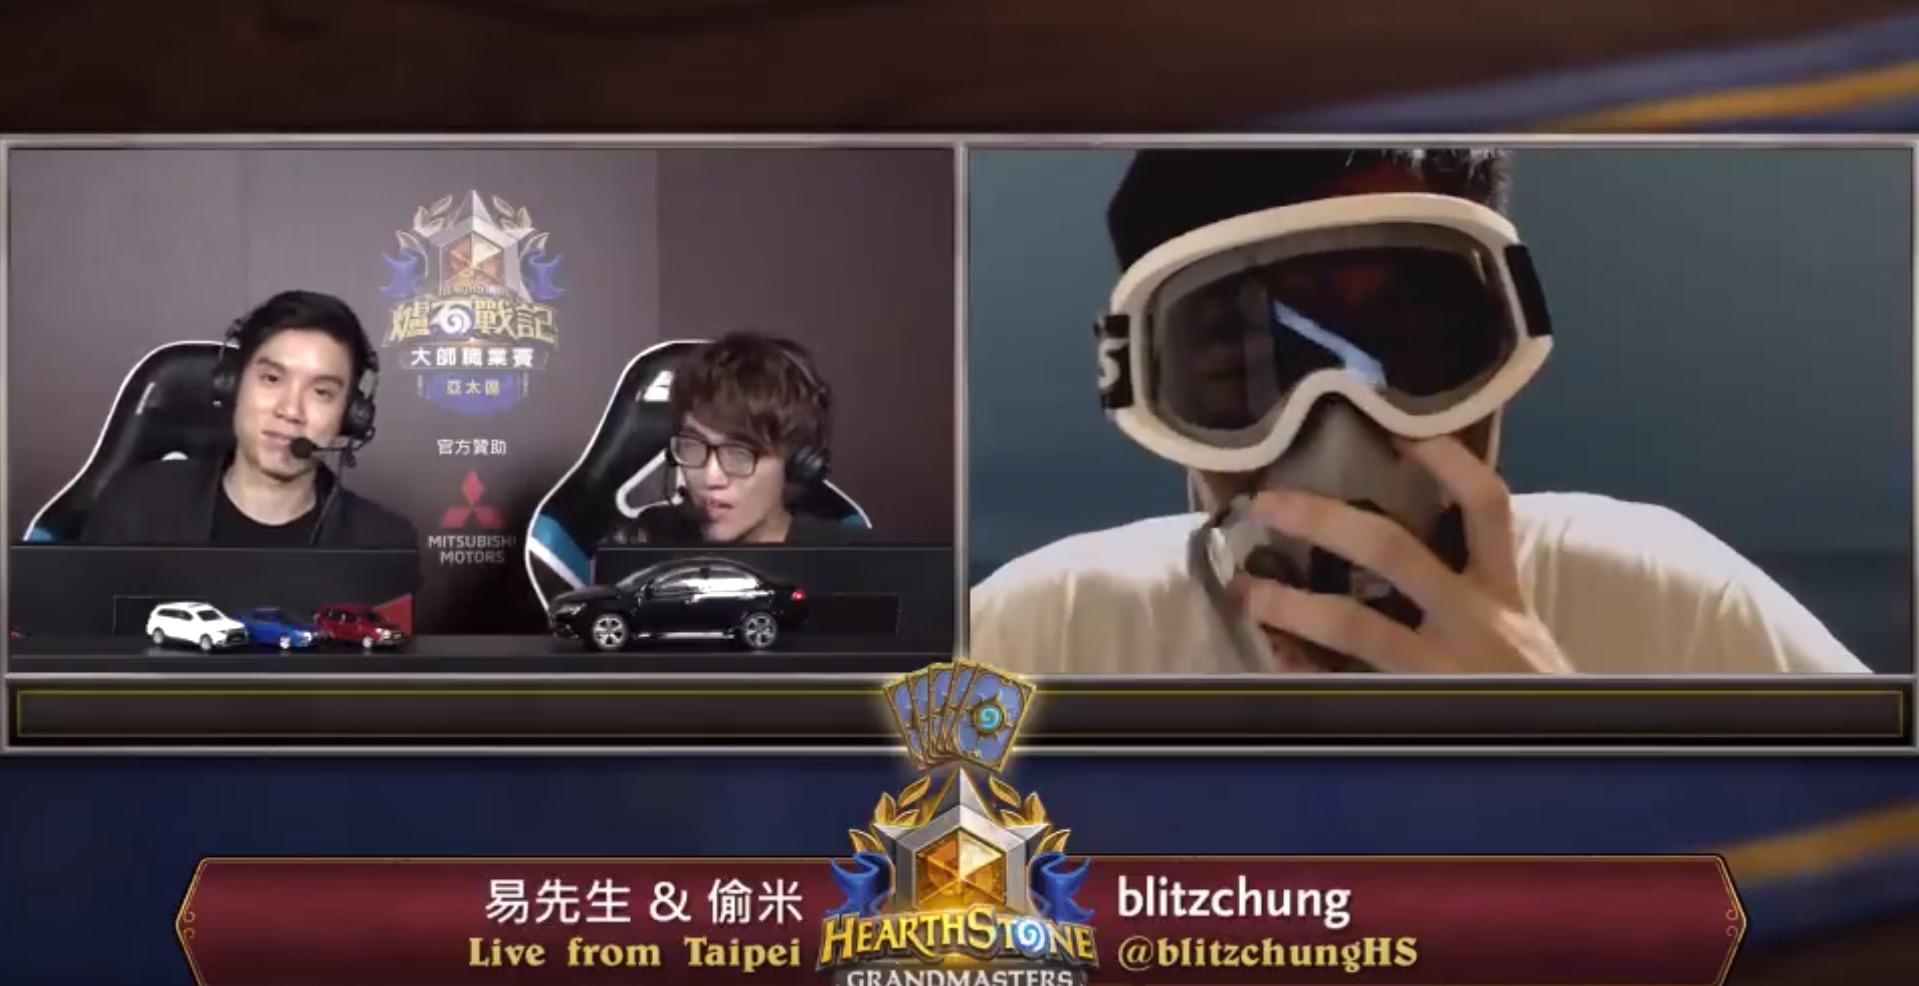 Hongkong Blizzard